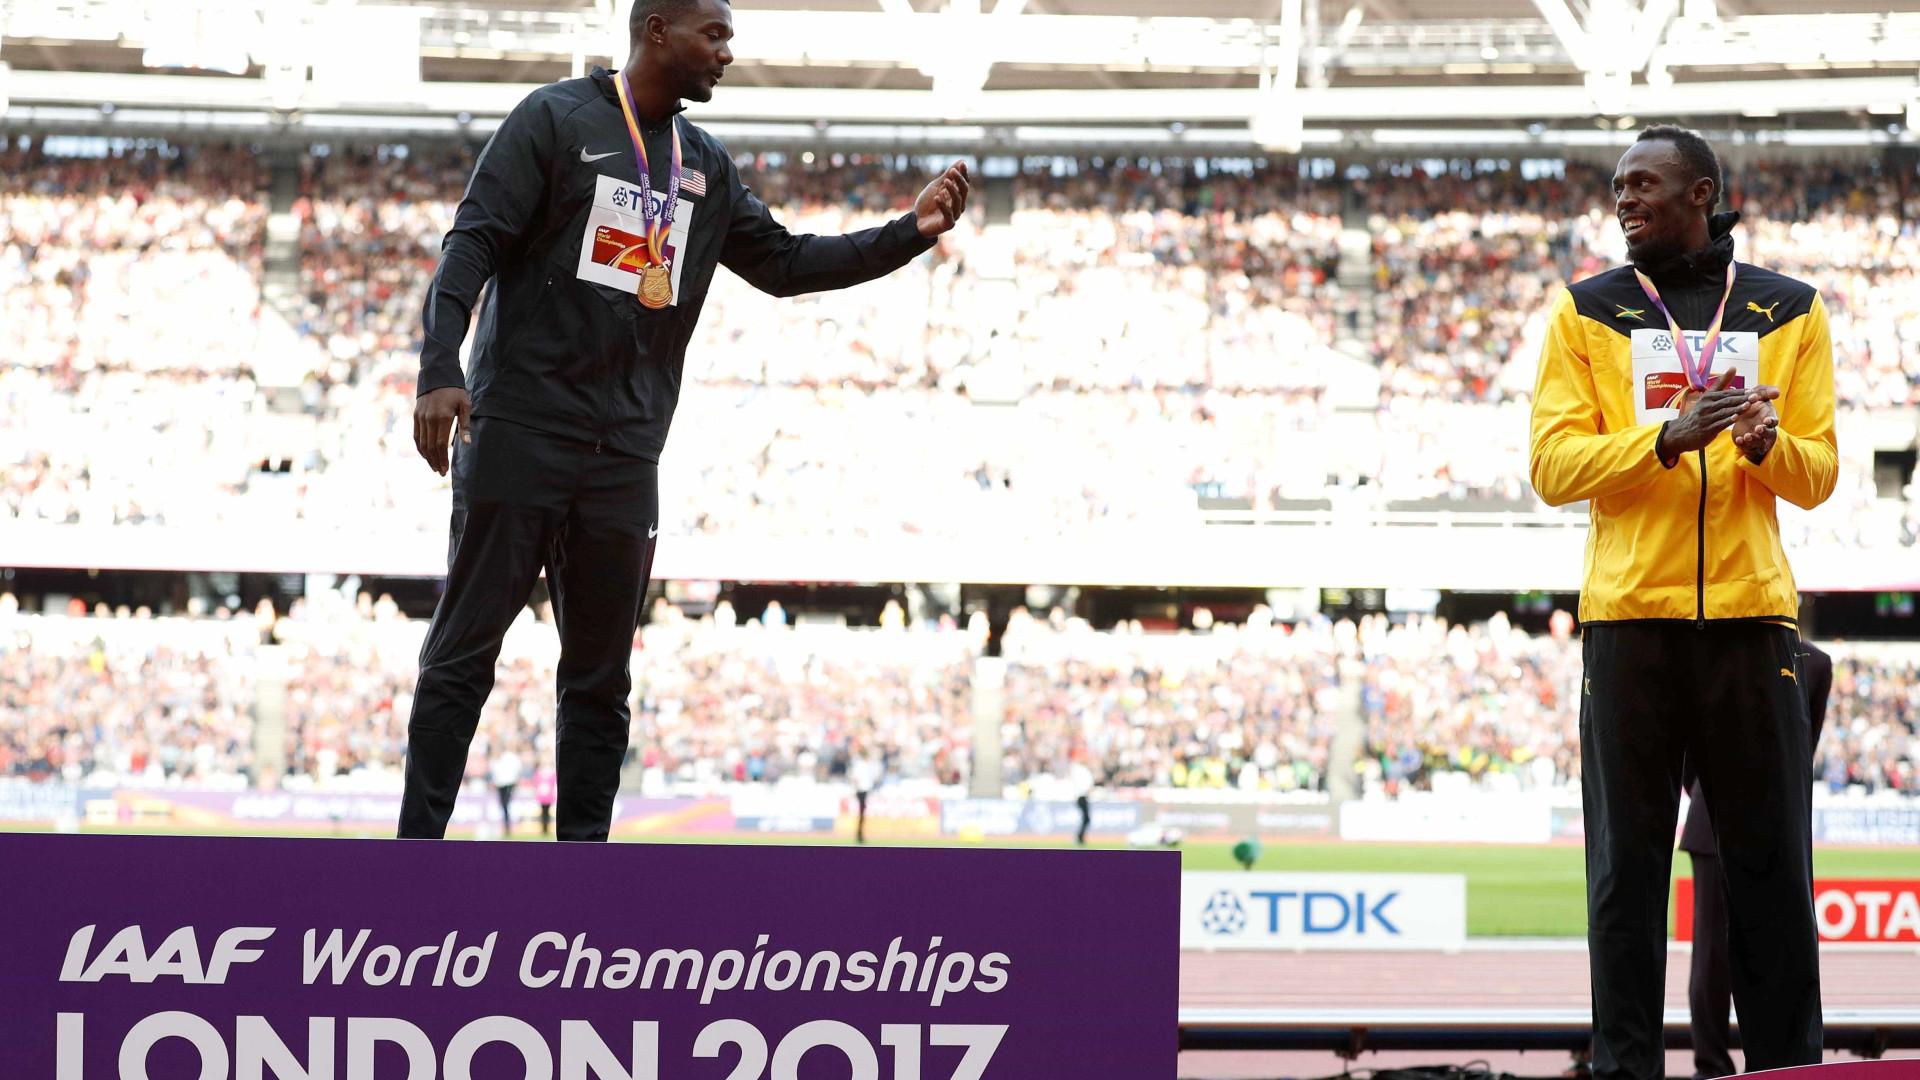 Bolt lesiona-se na última corrida da carreira